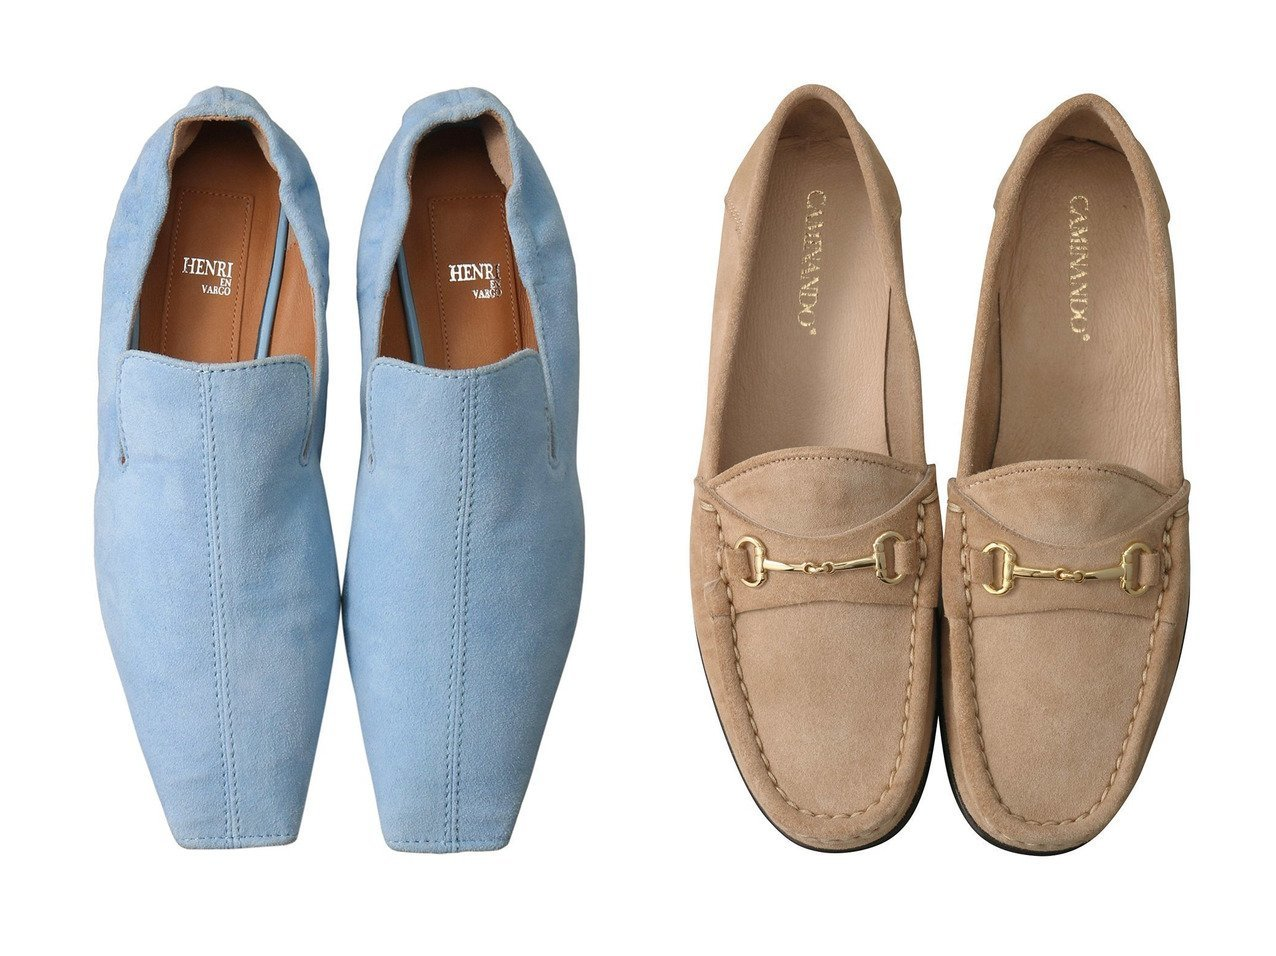 【GALLARDAGALANTE/ガリャルダガランテ】の【CAMINANDO】ビットローファー/BLACK LEATHER&【HENRI EN VARGO/ヘンリ エン ヴァーゴ】のMary スエードスリッポン シューズ・靴のおすすめ!人気、トレンド・レディースファッションの通販 おすすめで人気の流行・トレンド、ファッションの通販商品 メンズファッション・キッズファッション・インテリア・家具・レディースファッション・服の通販 founy(ファニー) https://founy.com/ ファッション Fashion レディースファッション WOMEN 2021年 2021 2021 春夏 S/S SS Spring/Summer 2021 S/S 春夏 SS Spring/Summer シューズ スエード フラット リラックス 春 Spring |ID:crp329100000025322